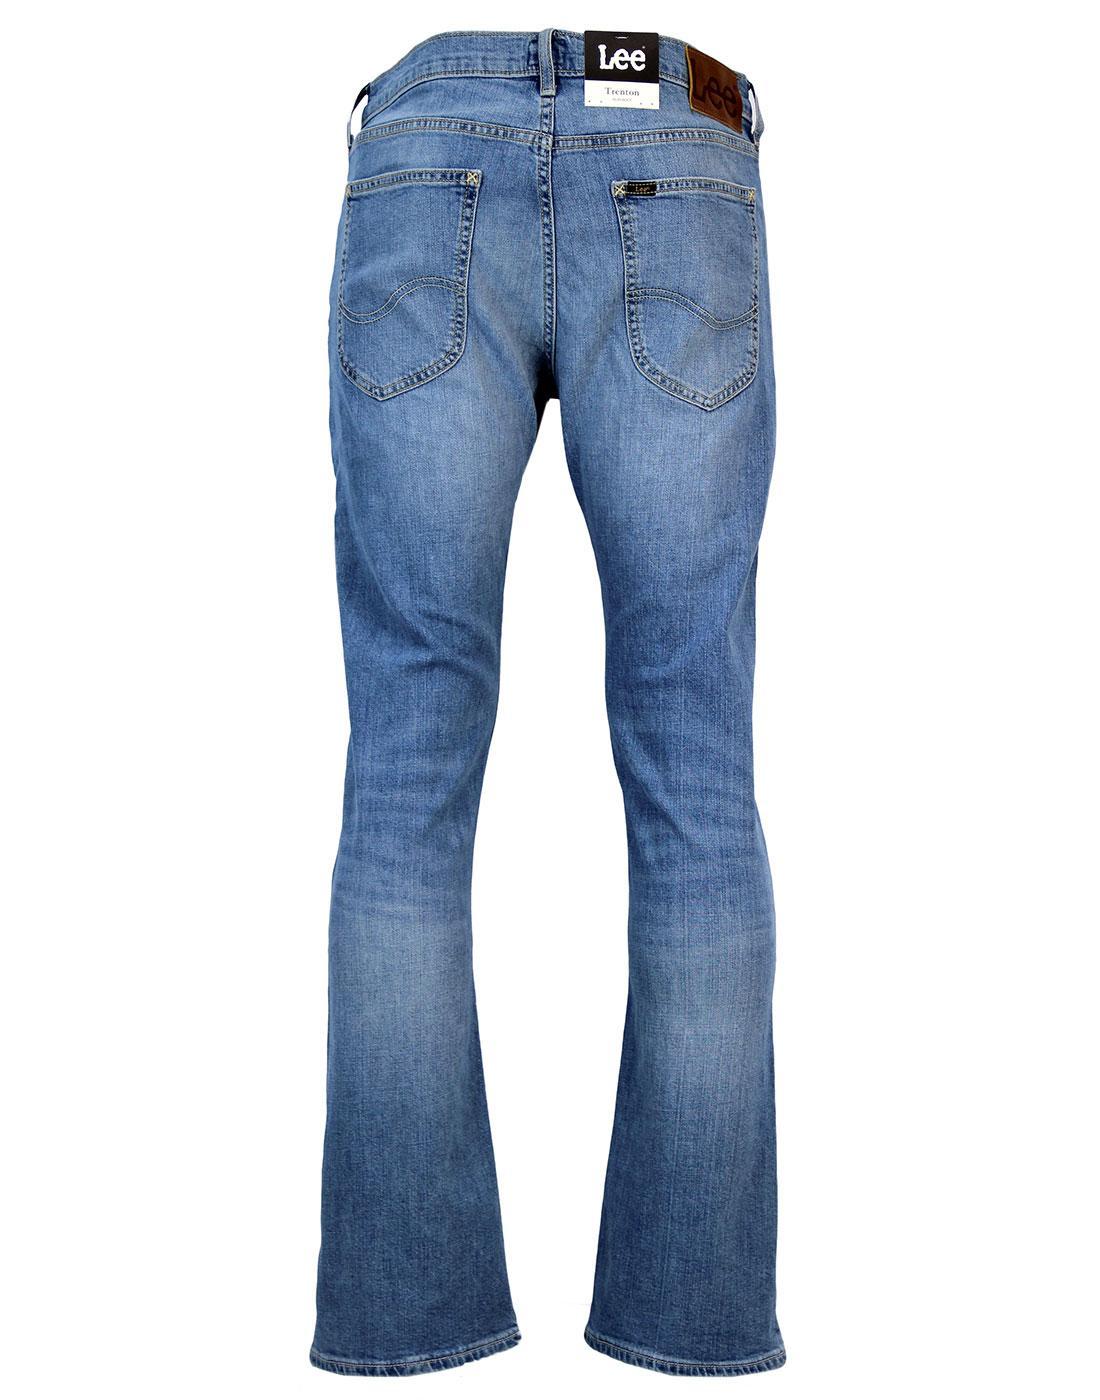 Denim Ocean Lee Jeans Bootcut Retro Mod Trenton Caribbean 1970s rCQxtsdh